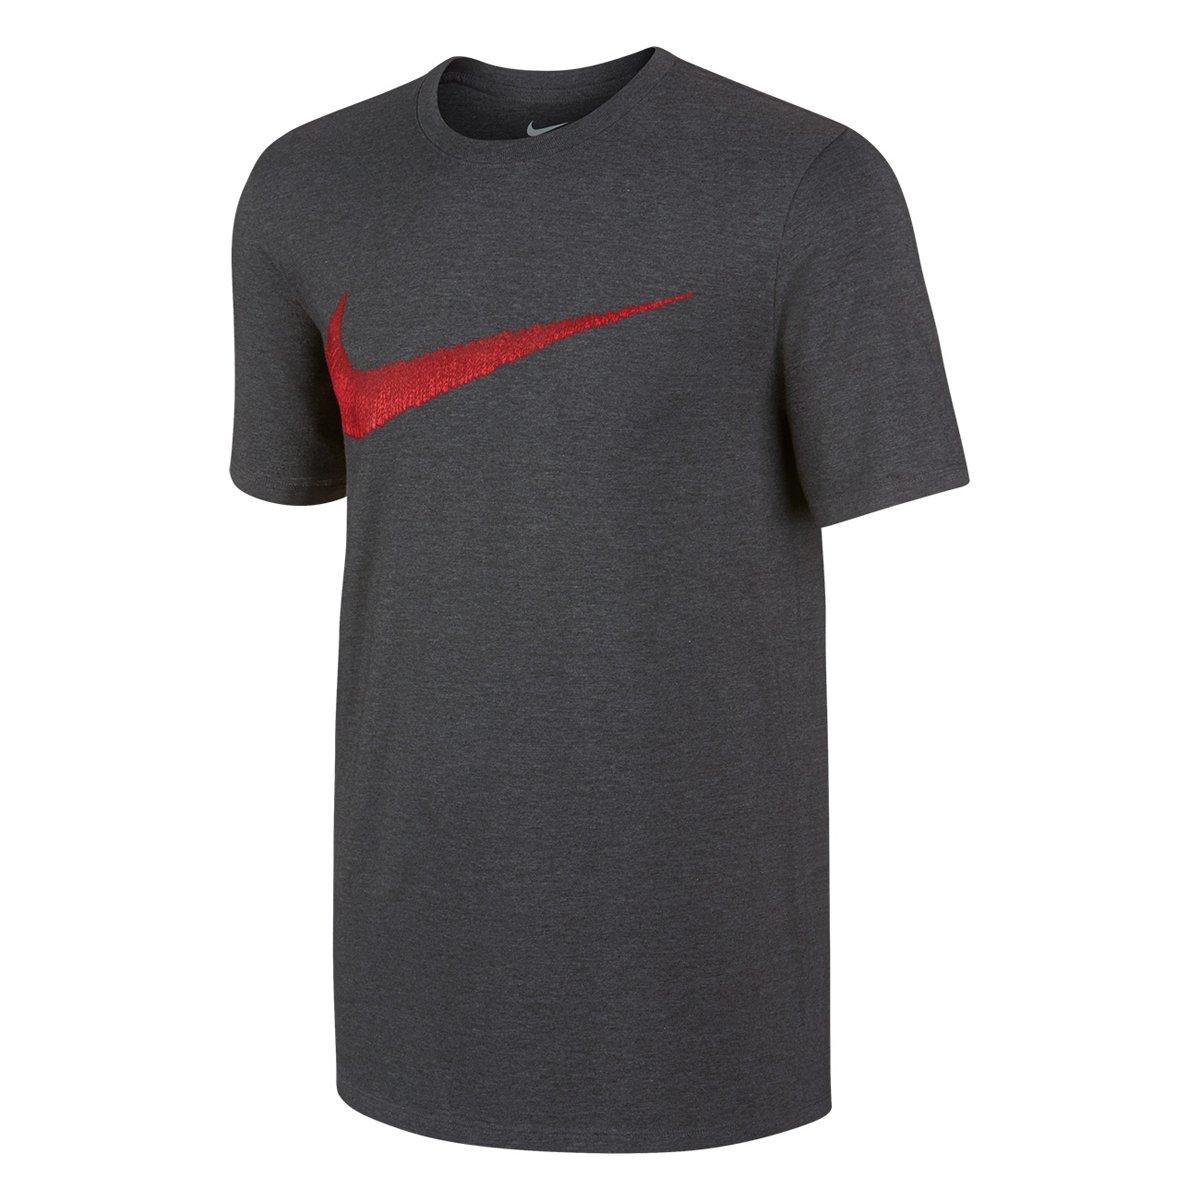 Camiseta Nike Nsw Tee Hangtag Swoosh Masculina - Compre Agora  679da125e4e12